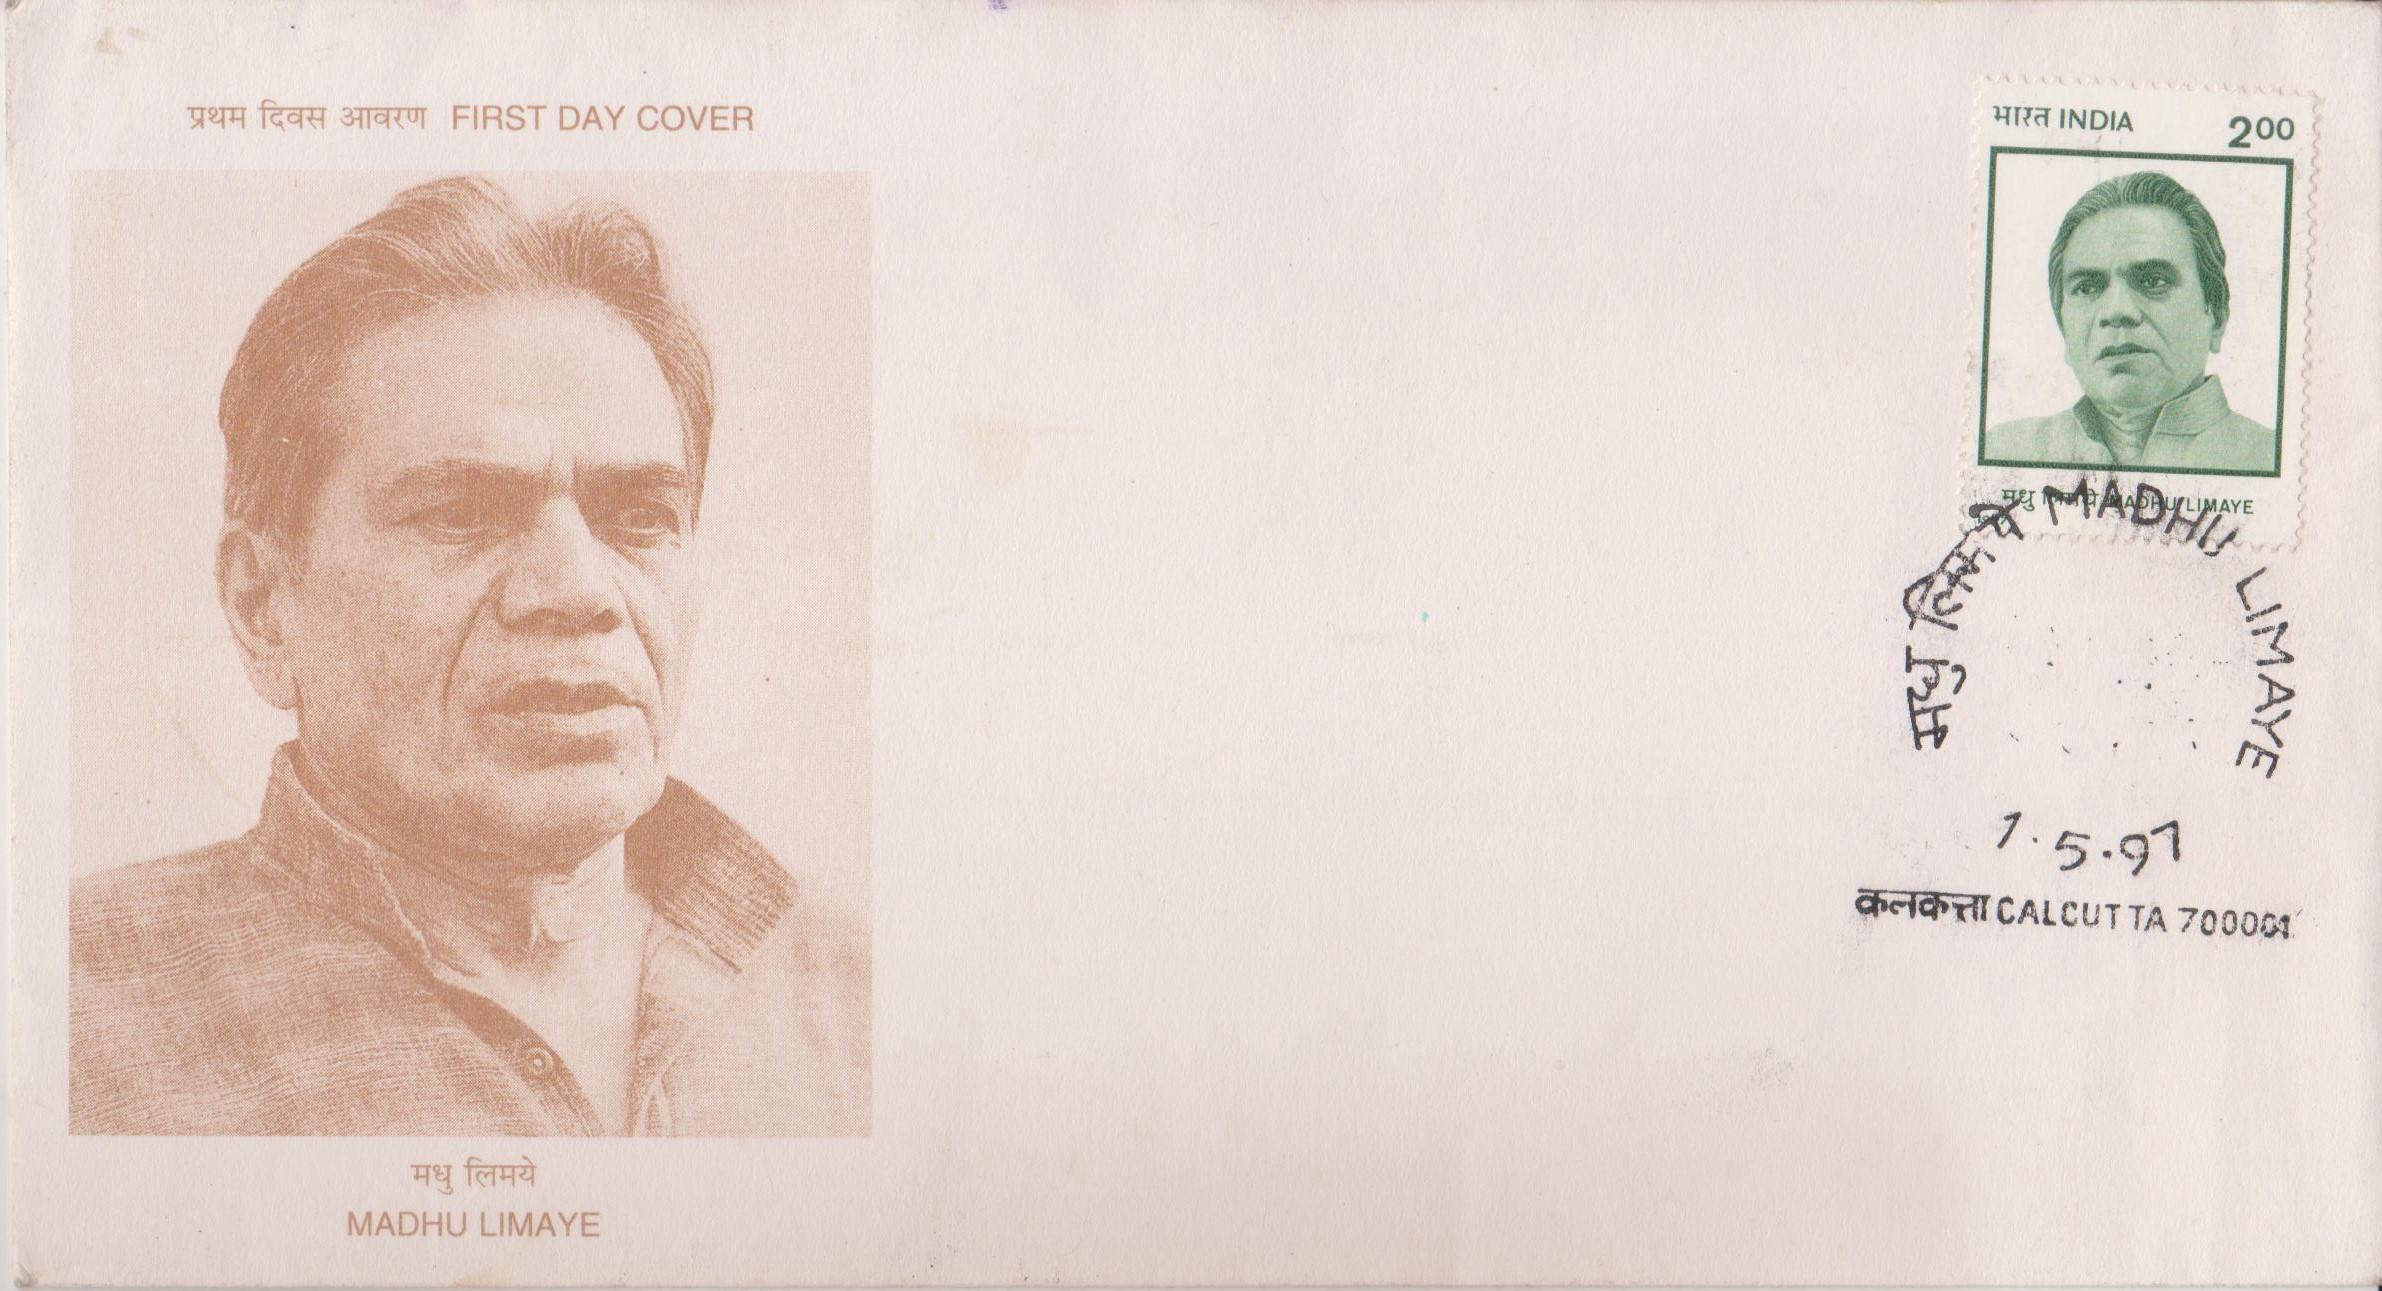 Congress Socialist Party, Goa Liberation, Poona, Pune